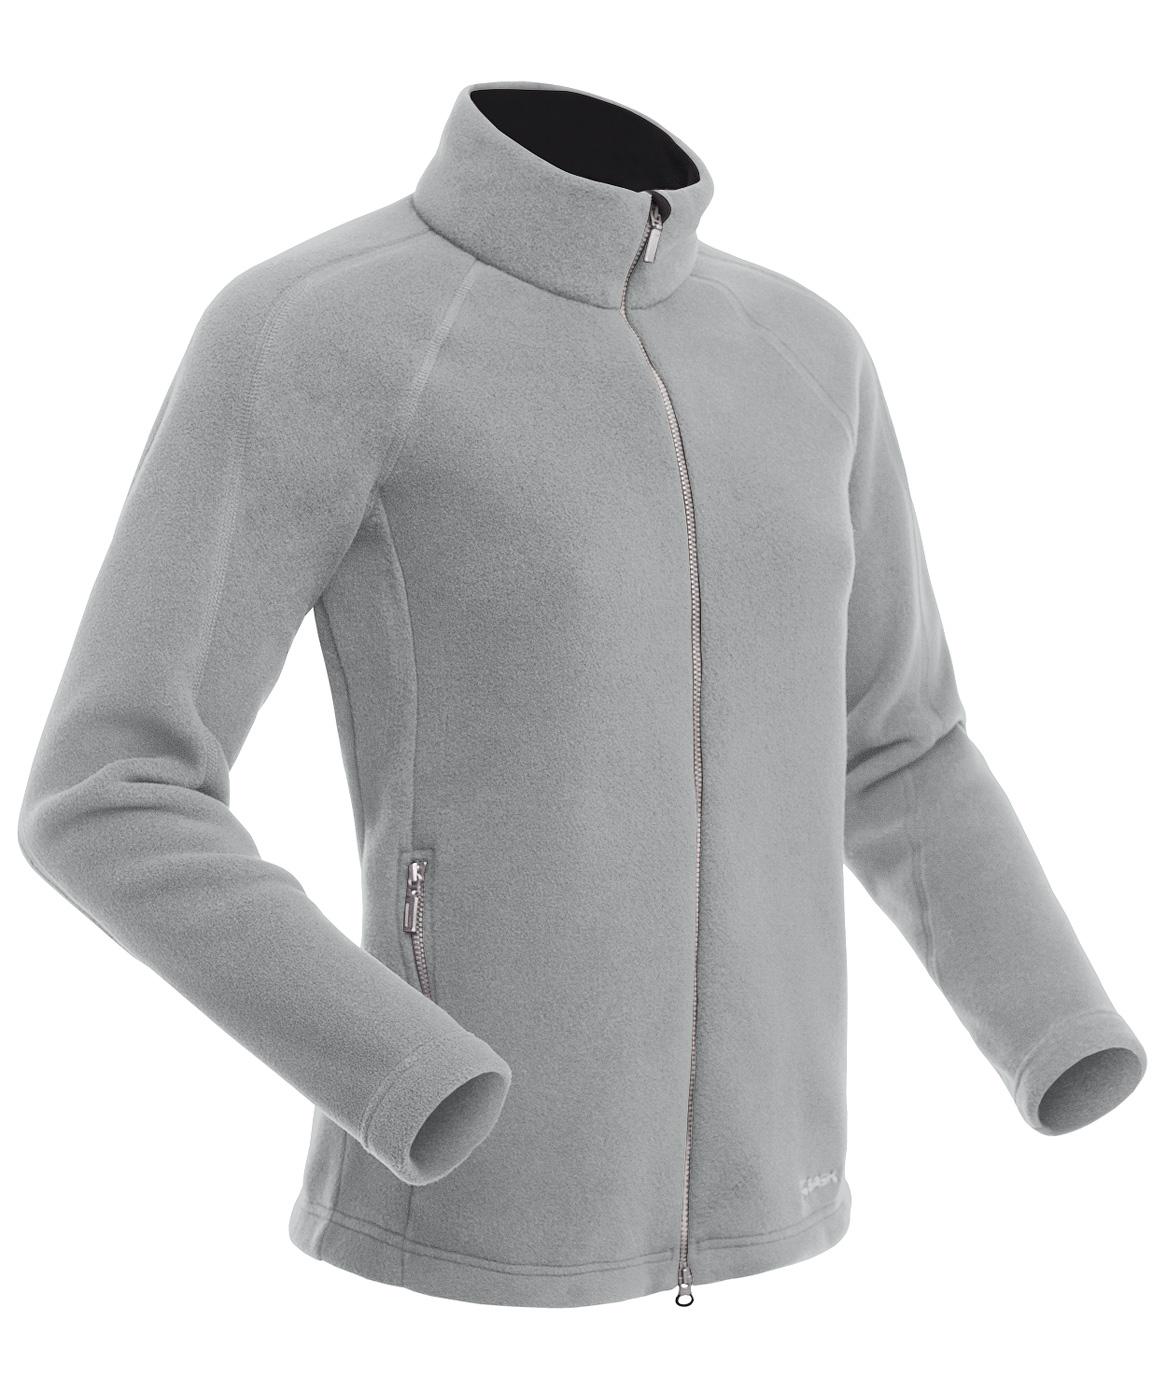 Куртка BASK JUMP LJ 2261, JUMP LJ